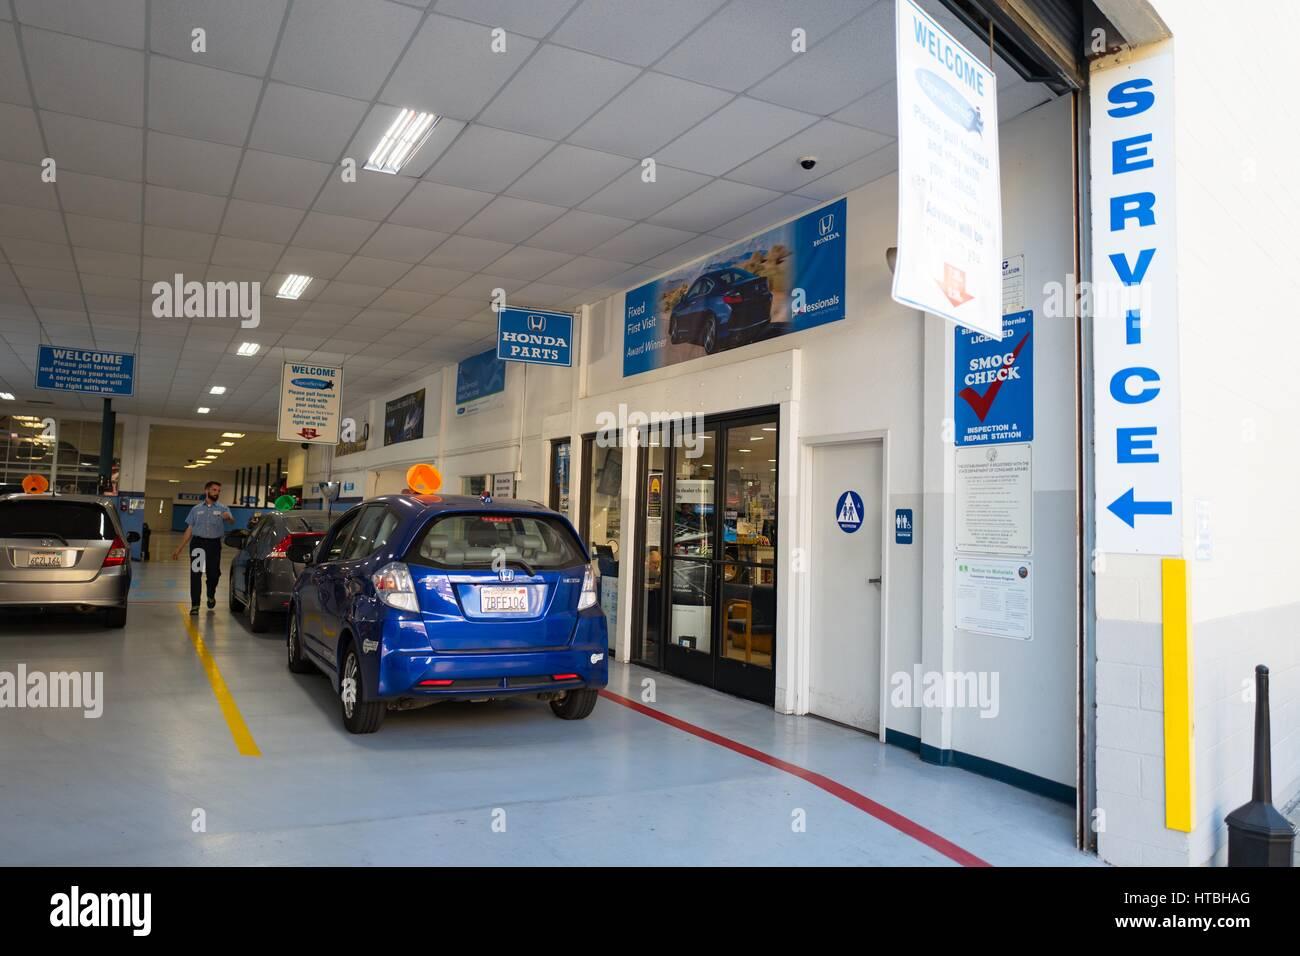 A compact Honda automobile pulls into the service center of a Honda